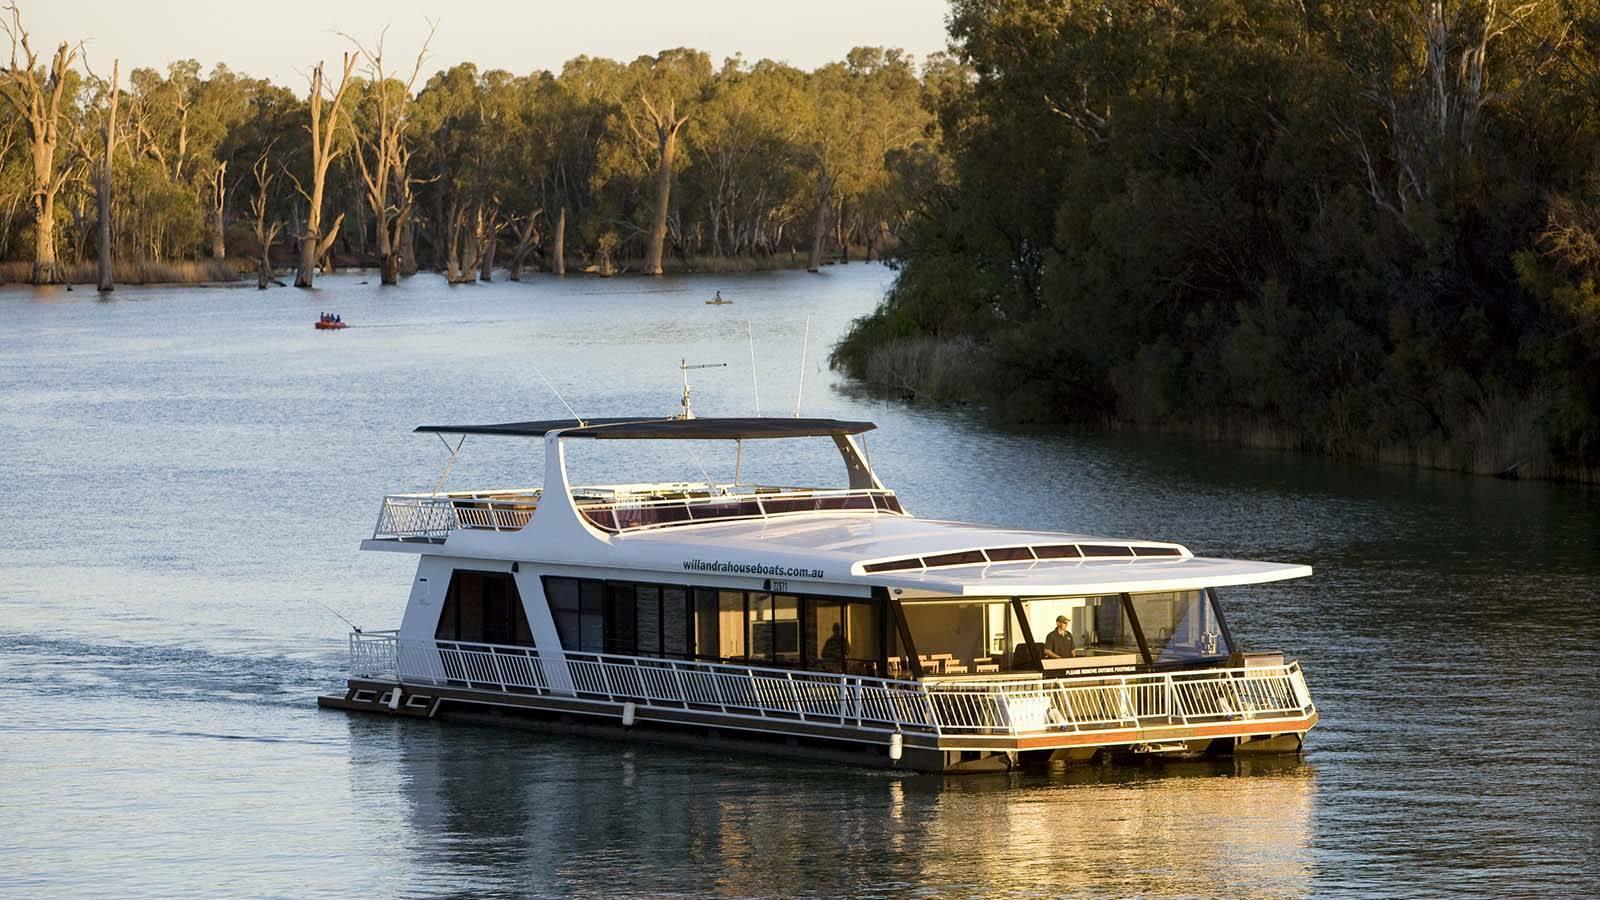 All Seasons Houseboats, The Murray, Victoria, Australia